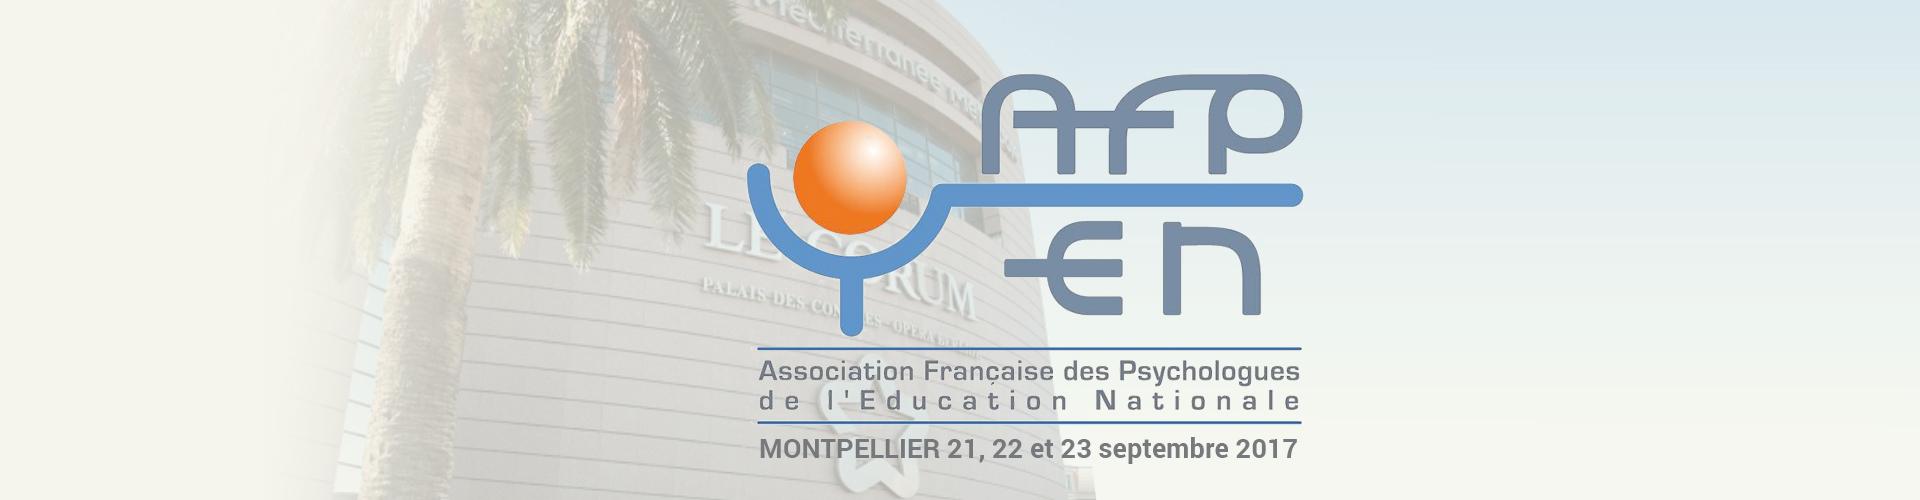 actu-francaisphilo1920x500.jpg